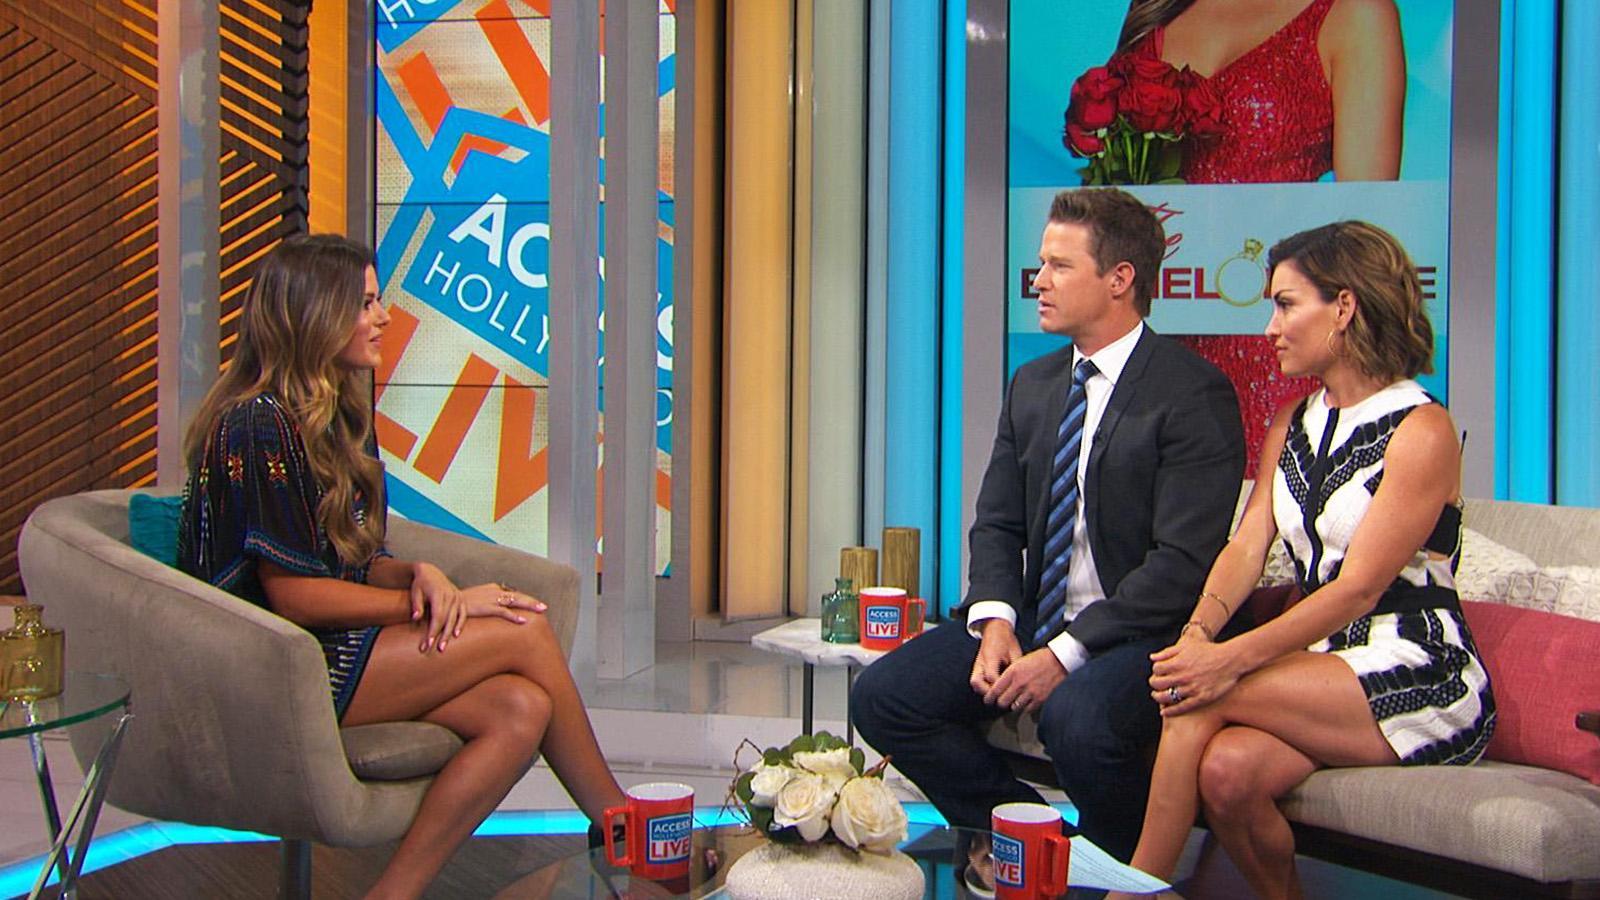 'Bachelorette' JoJo Fletcher On Her 'Crazy,' 'Amazing' & 'Emotional' Season